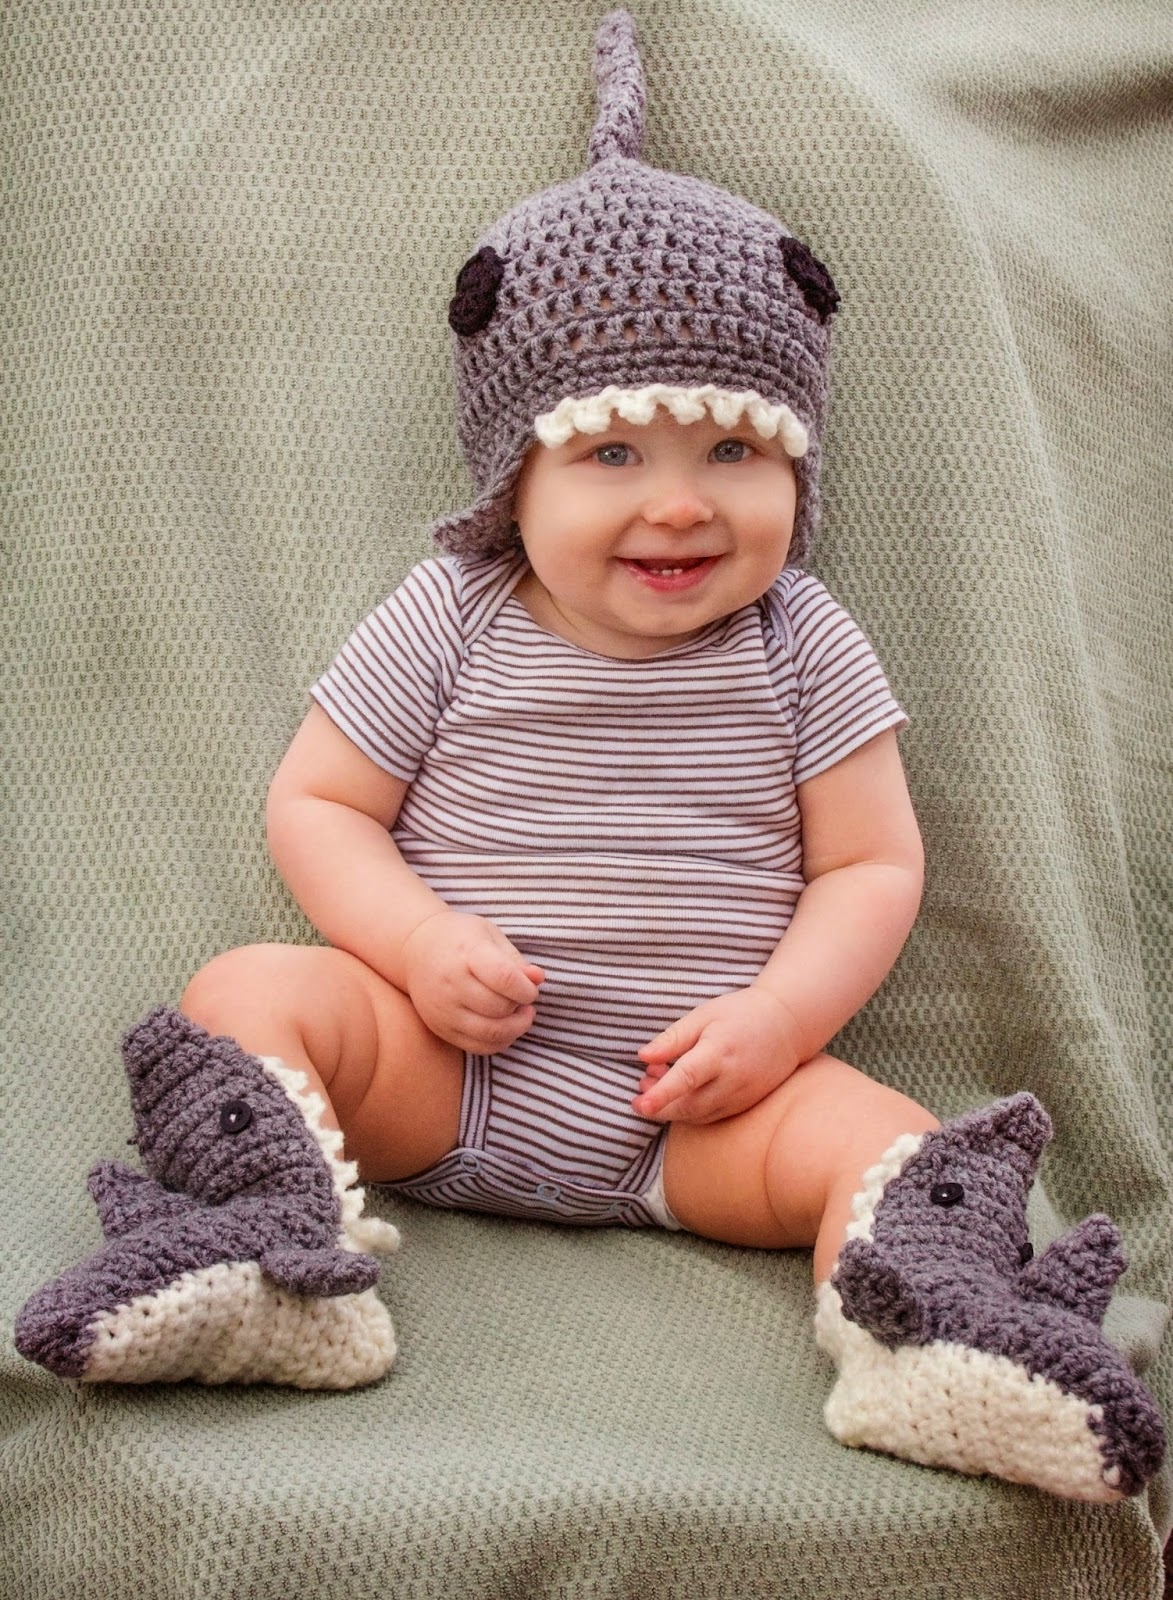 59d96740c2f Fiber Flux  Sharks! 4 Fun and Free Crochet Patterns...